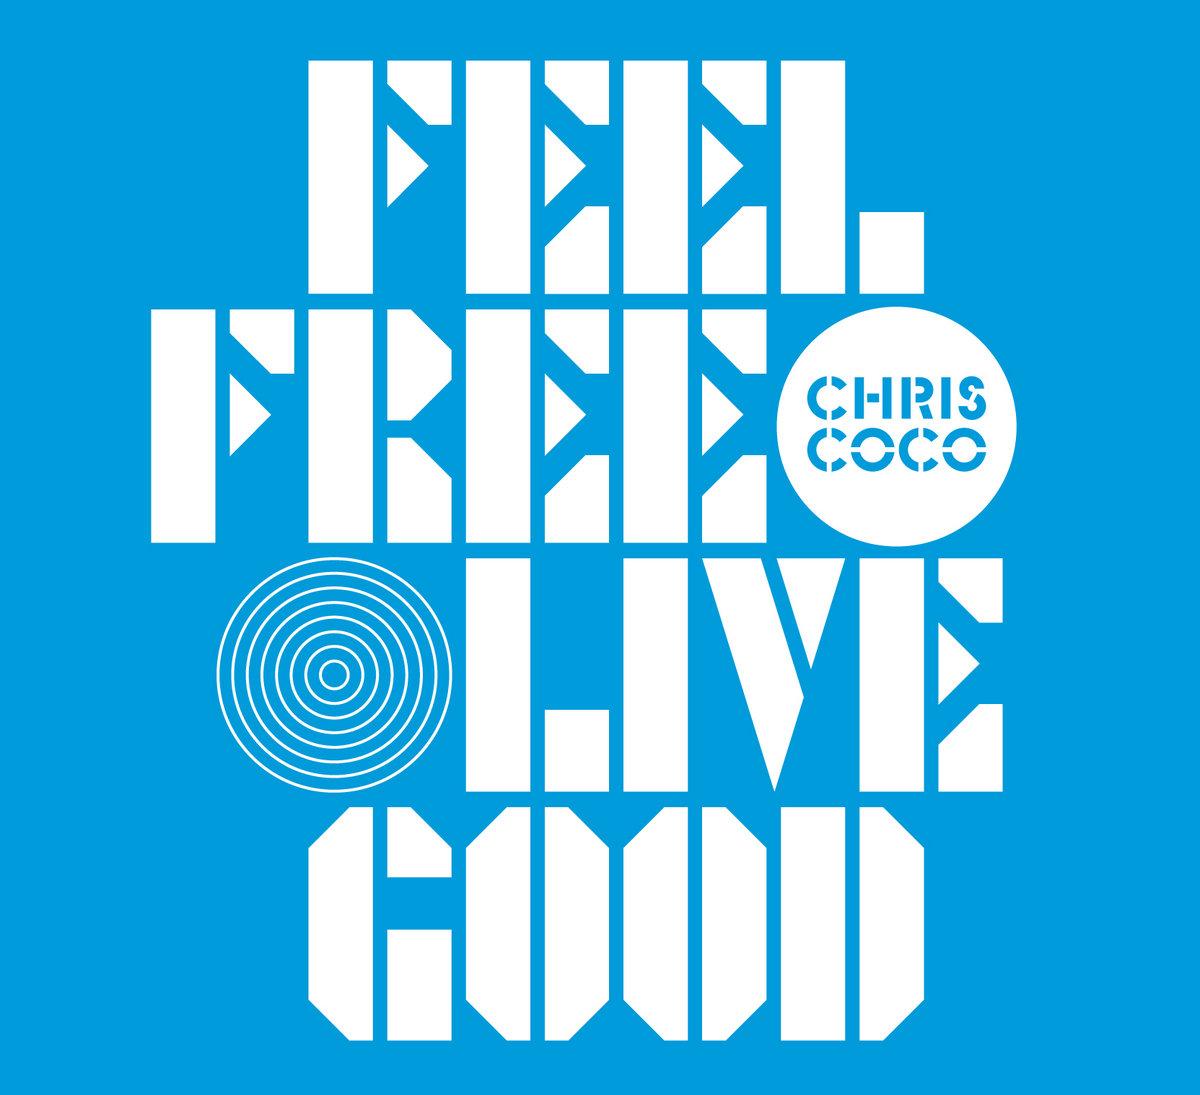 Feel Free Live Good | Chris Coco